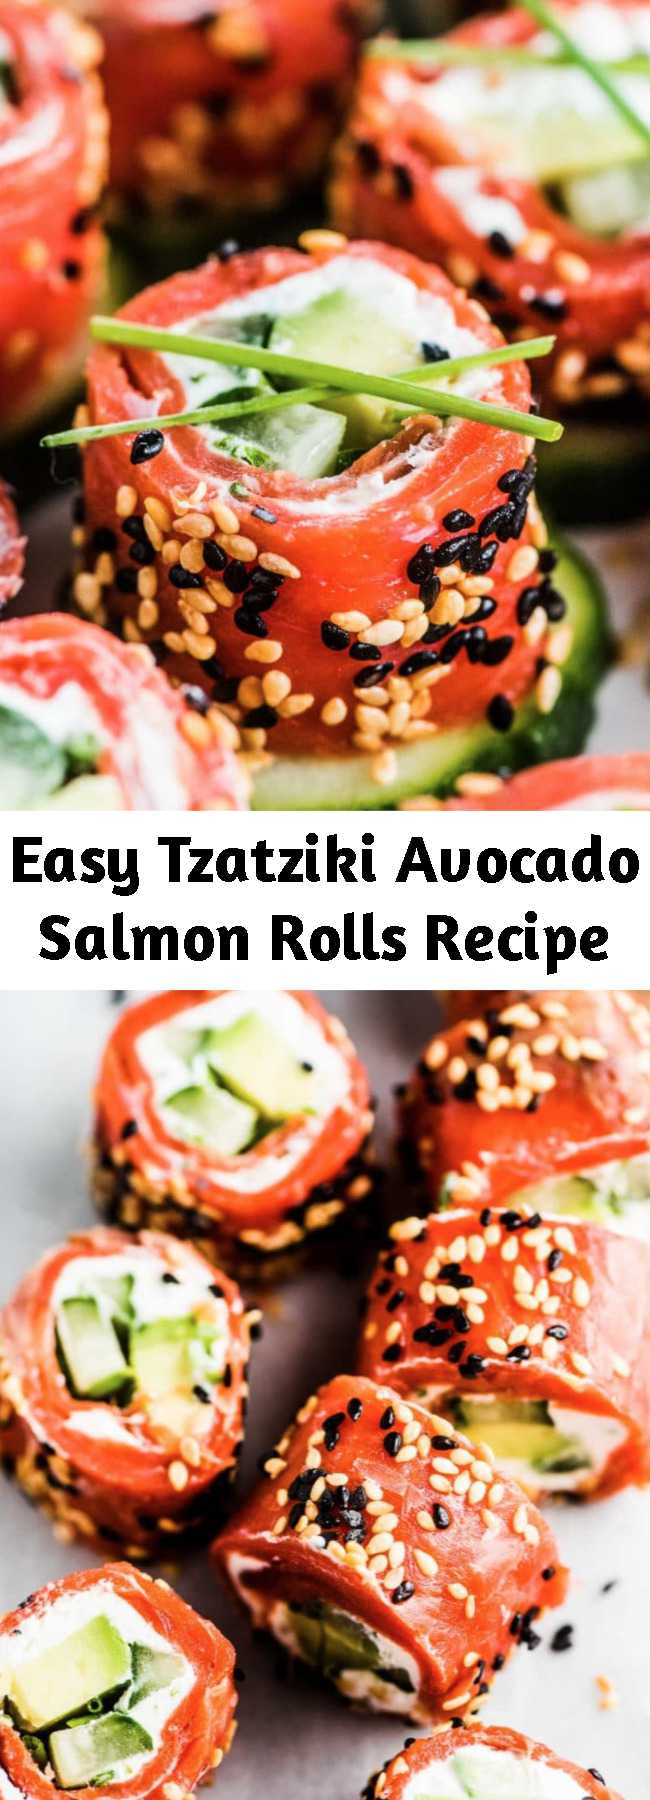 Easy Tzatziki Avocado Salmon Rolls Recipe - Tzatziki Avocado Salmon Rolls are the perfect party appetizer. They're totally delicious, easy to make, super pretty, and healthy. Bonus: they can be made ahead of time! #salmon #tzatziki #appetizer #seafood #fish #smokedsalmon #glutenfree #keto #lowcarb #holidayappetizer #partyappetizer #healthyrecipes #cucumber #cucumberbites #salmonroll